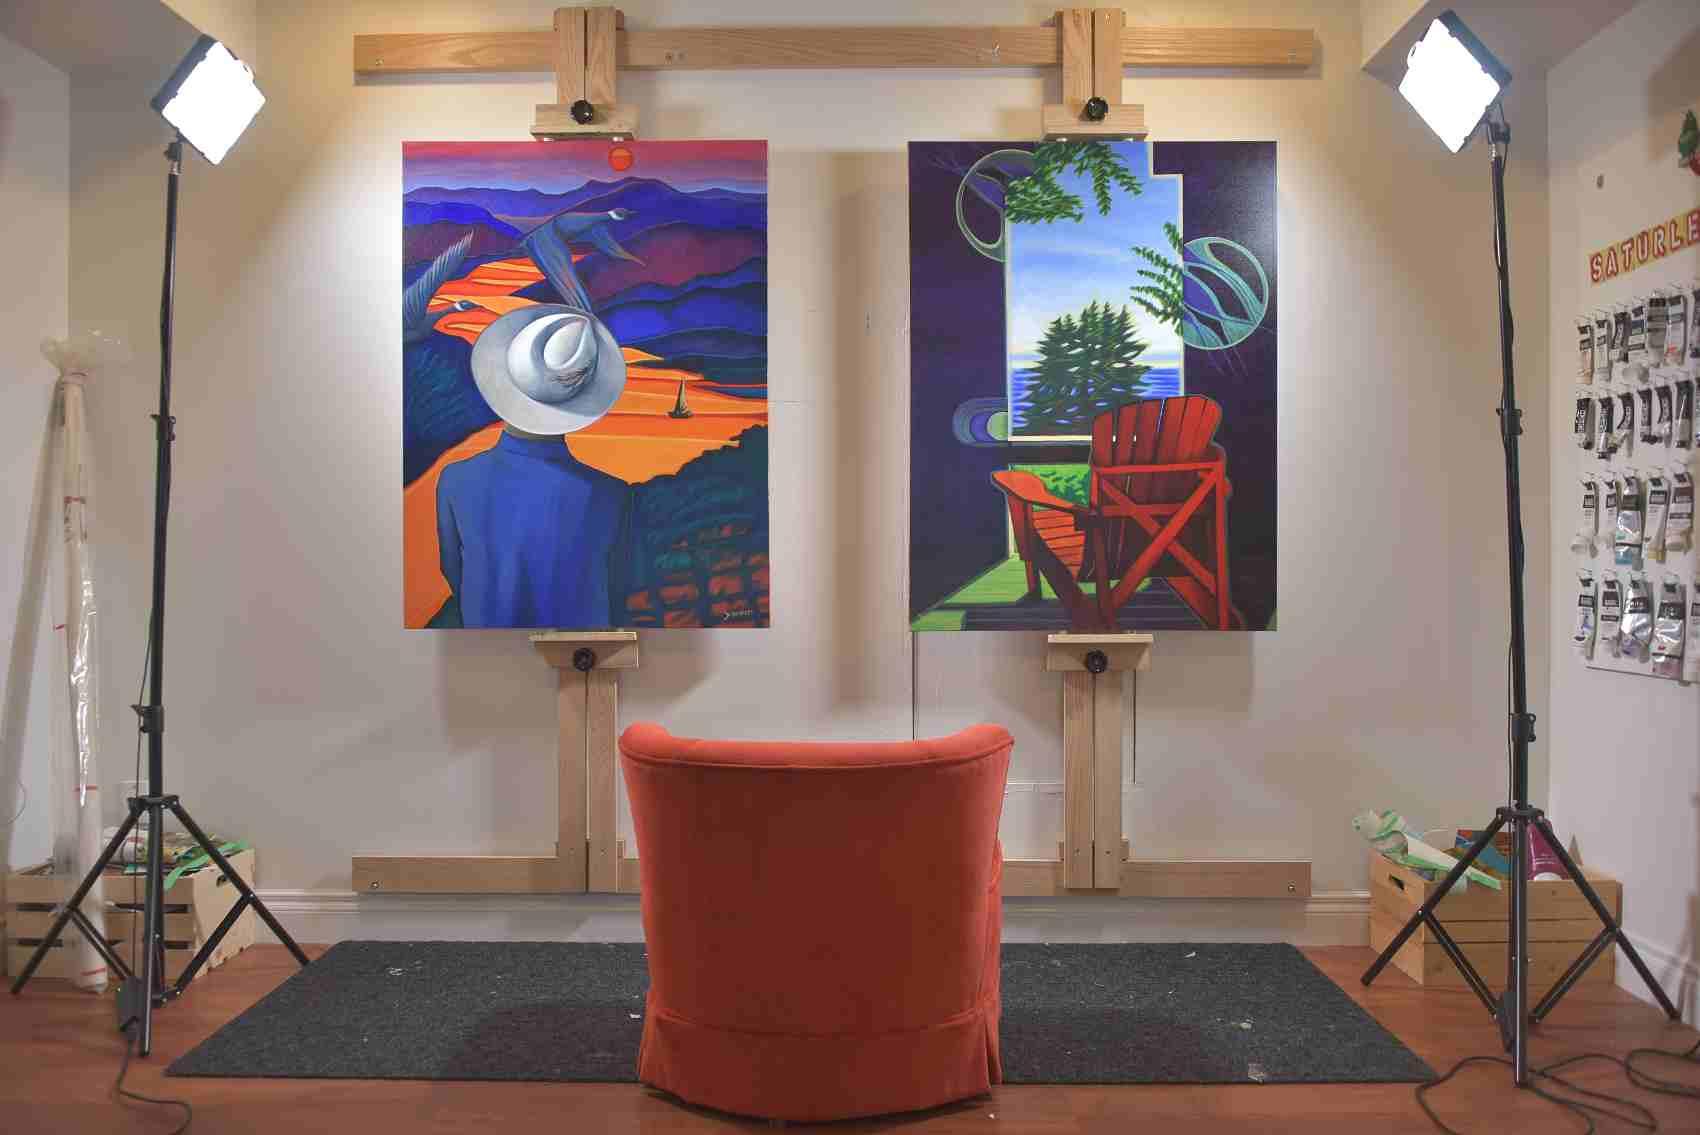 Canadian artist Brandy Saturley studio and paintings